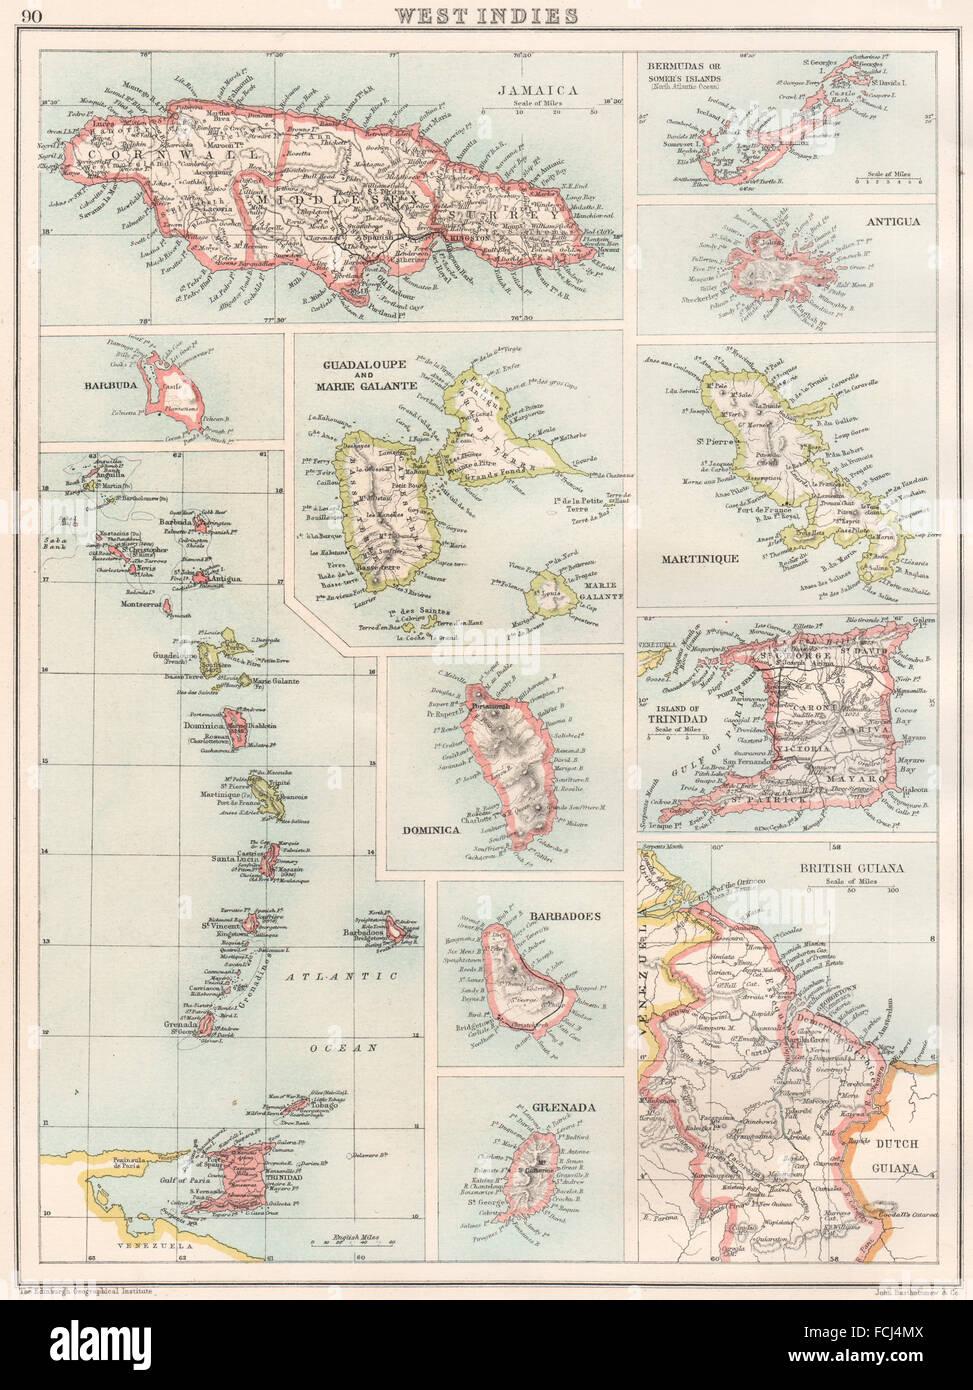 Barbados Bermuda Indias Guadalupe Martinica OccidentalesJamaica QrdxBWCeo